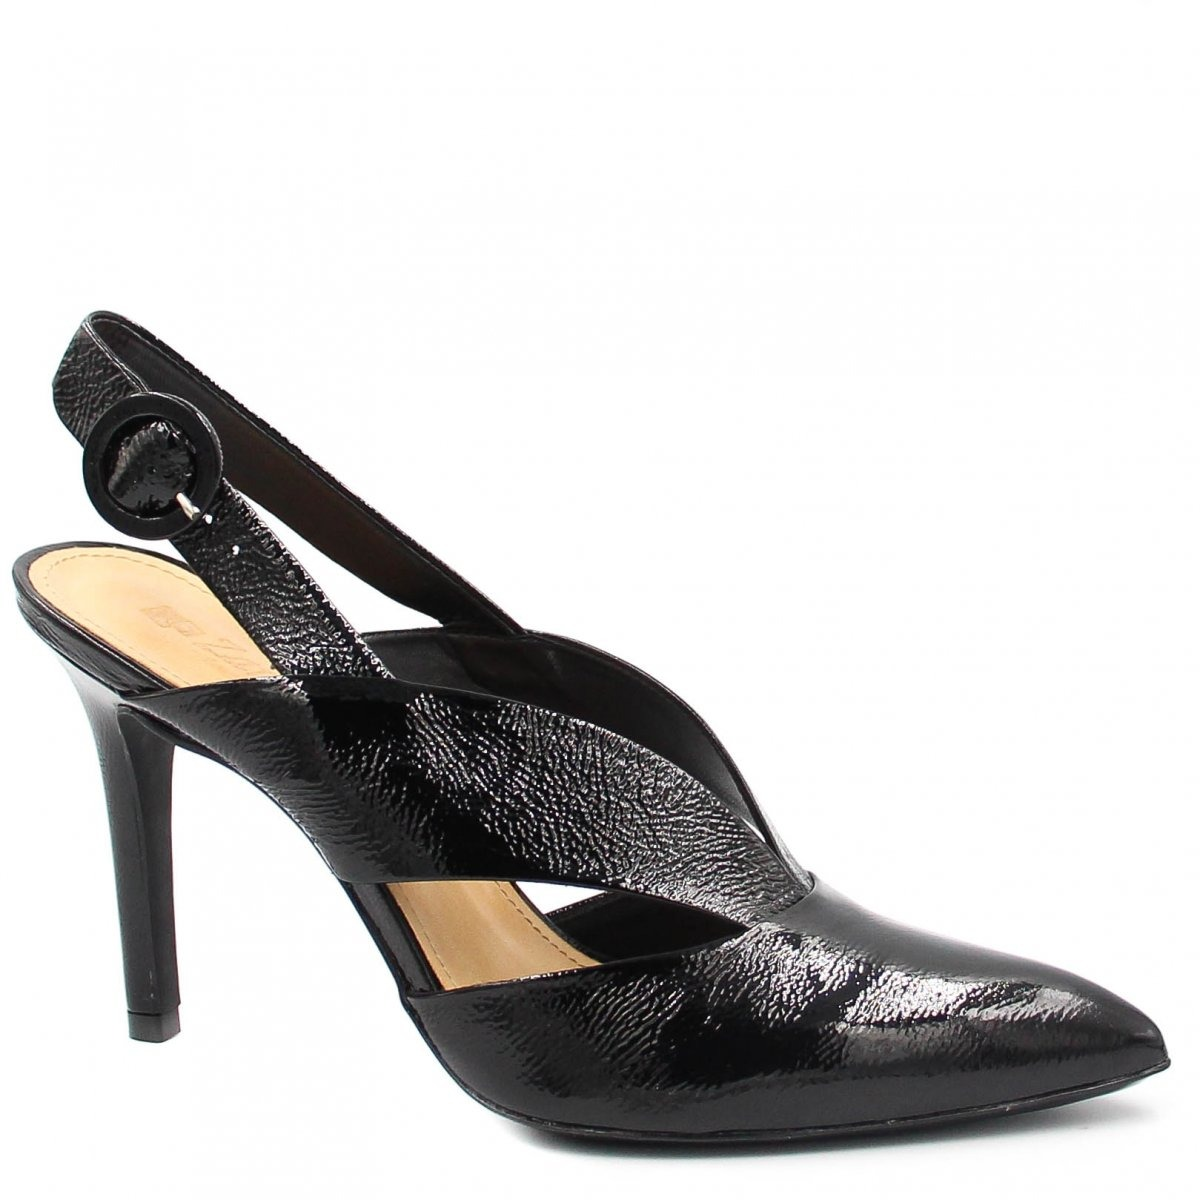 79a89aff43 Sapato Zariff Shoes Scarpin Salto Alto Fivela